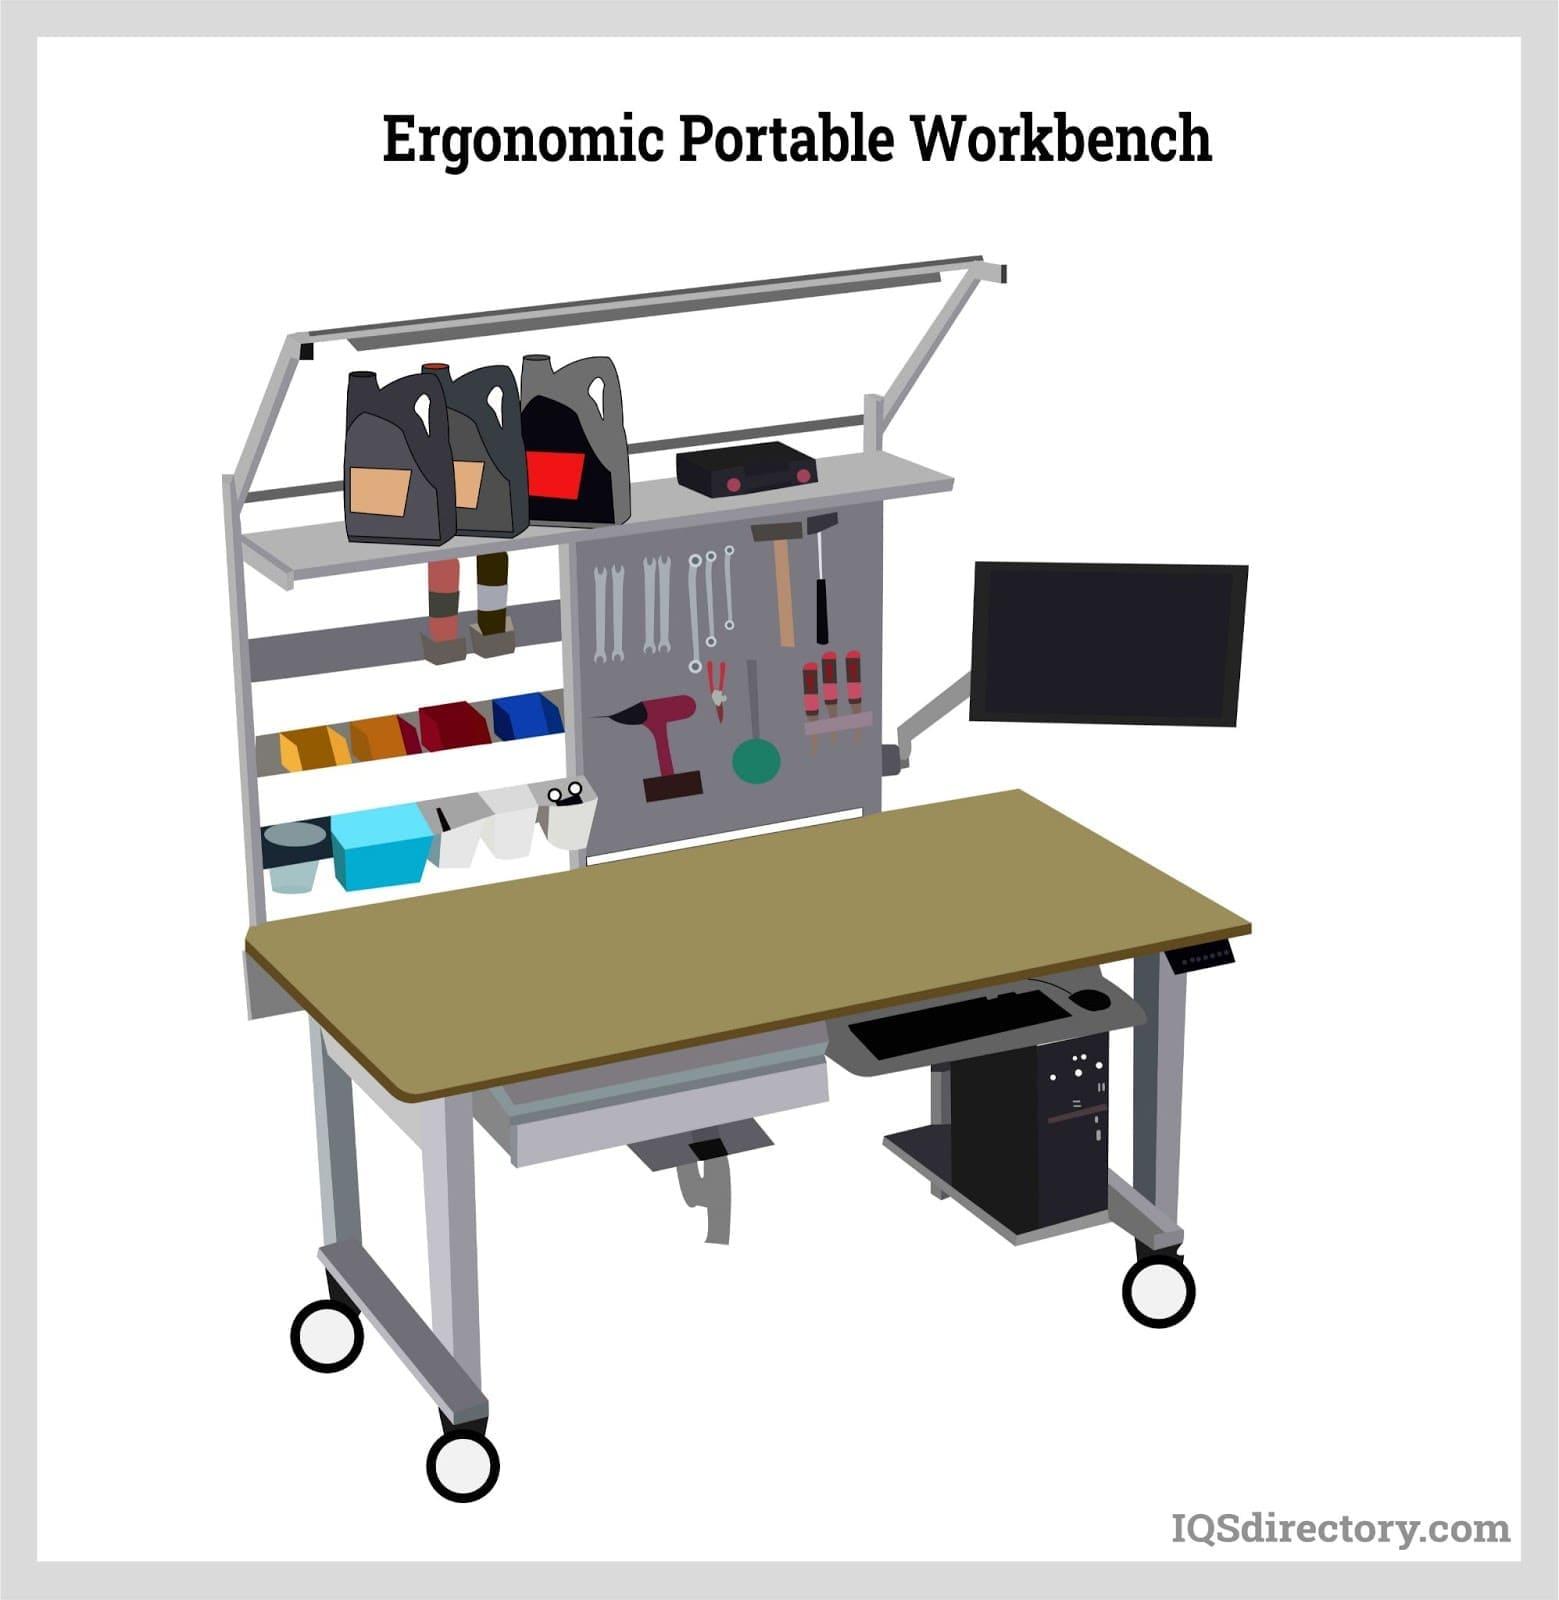 Ergonomic Portable Workbench